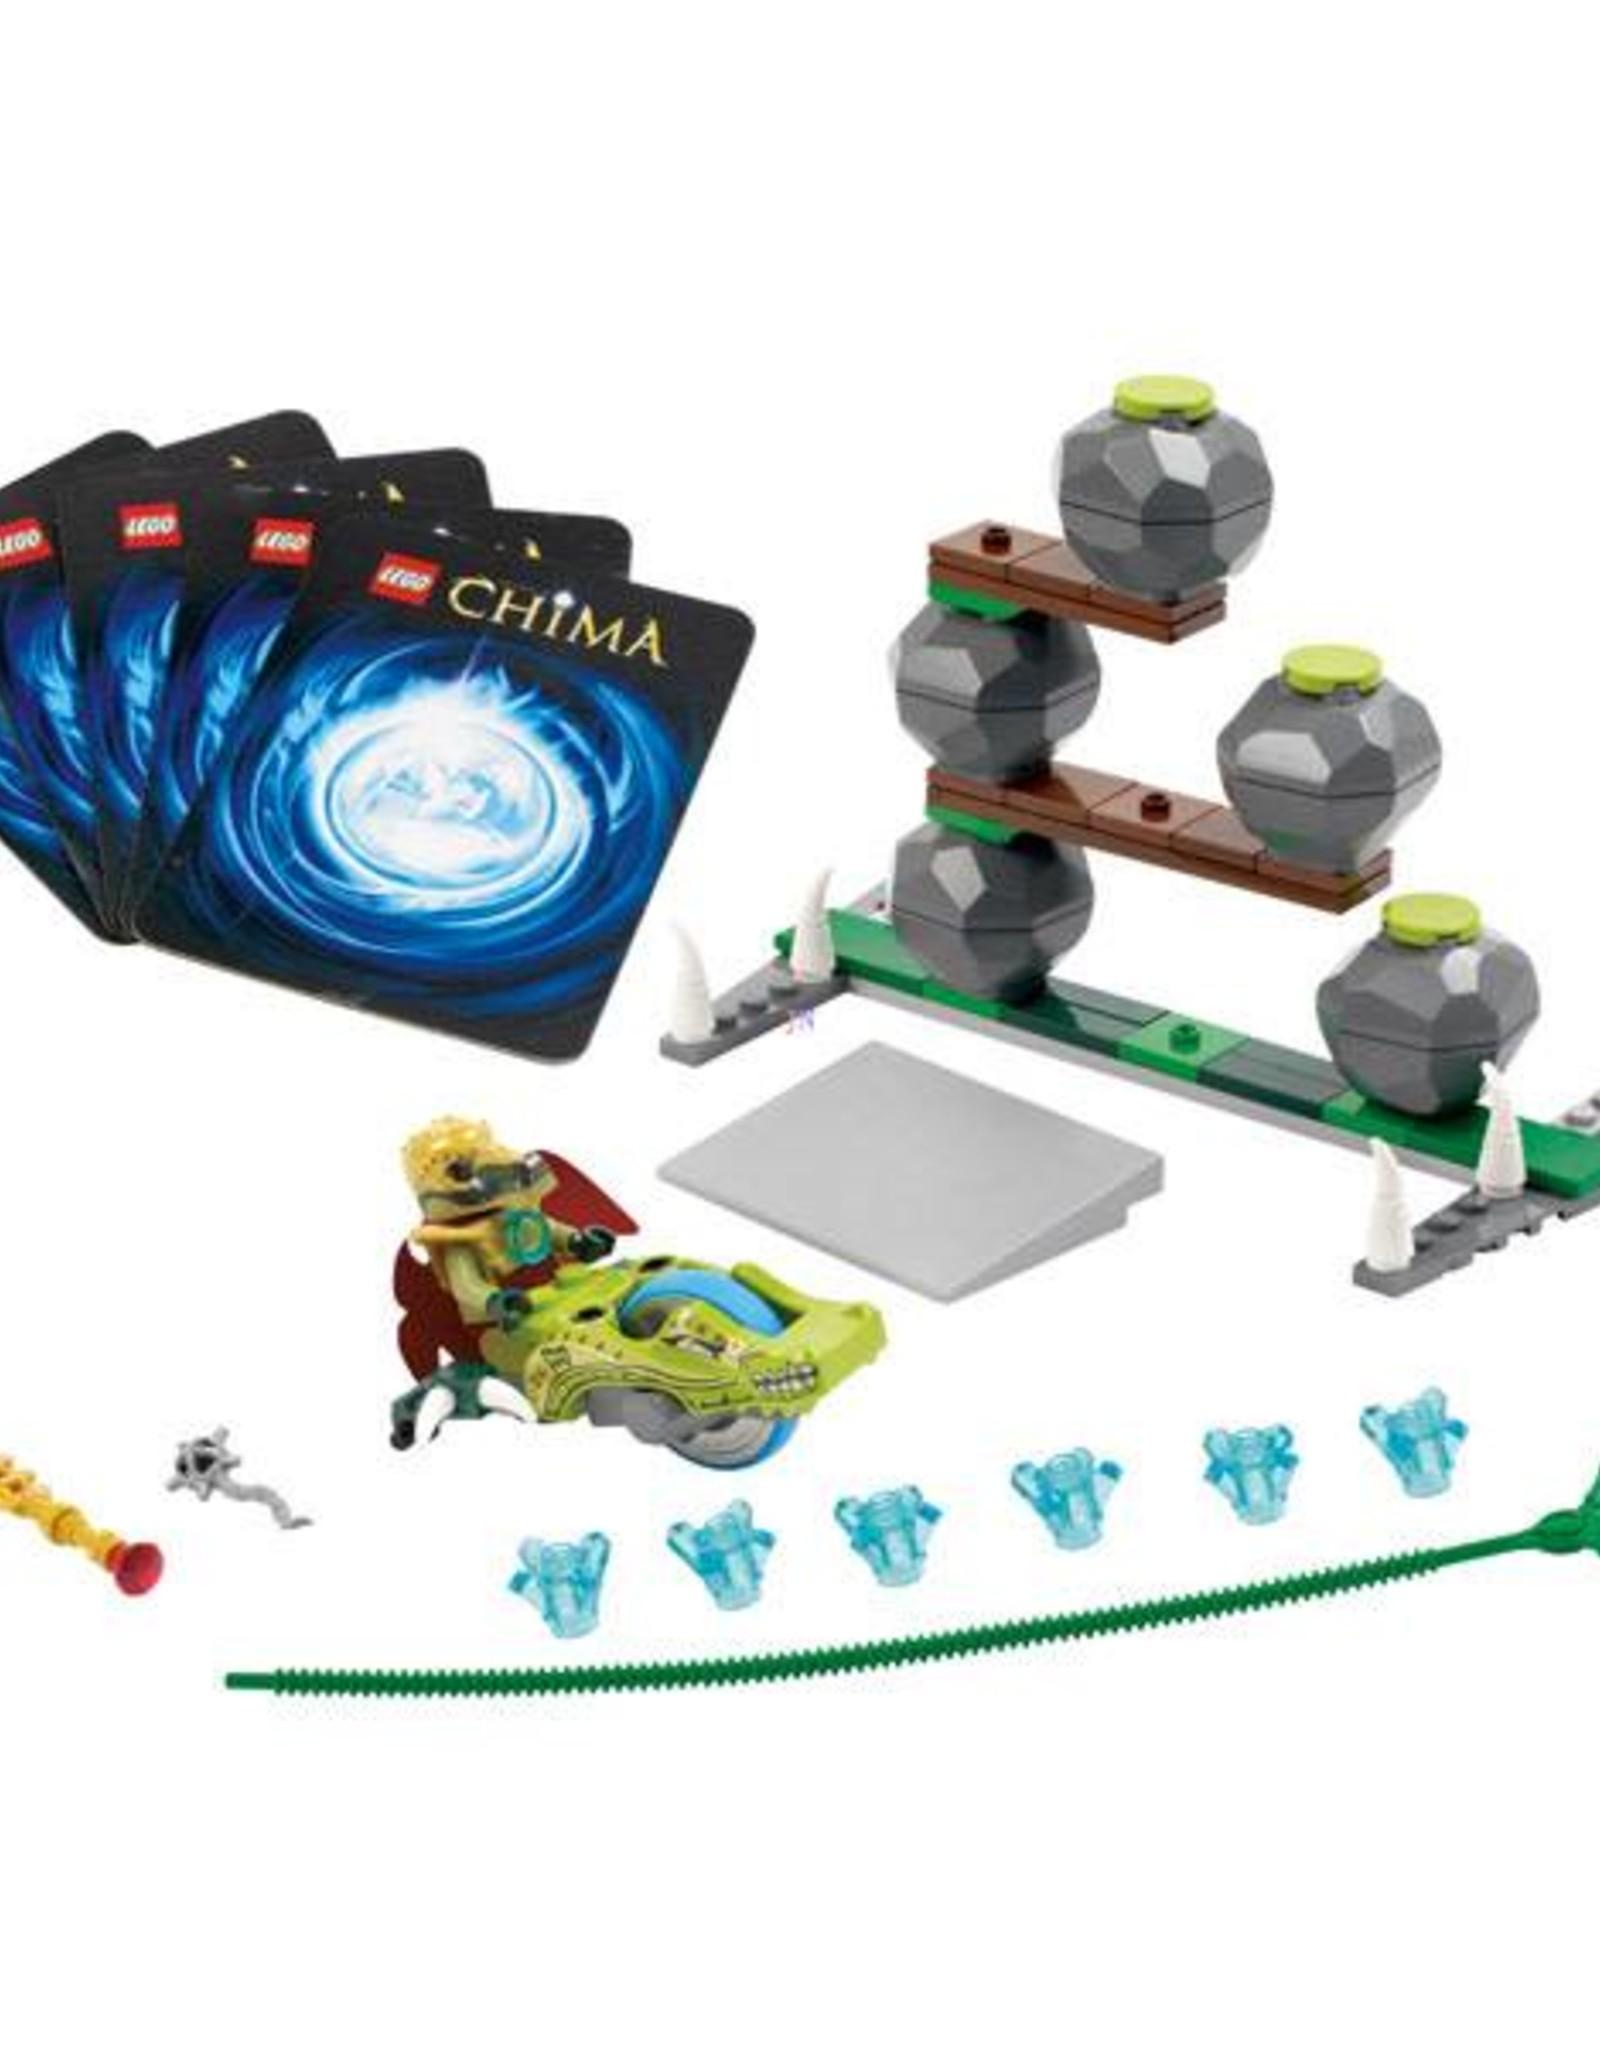 LEGO LEGO 70103 Crominus Boulder Bowling CHIMA